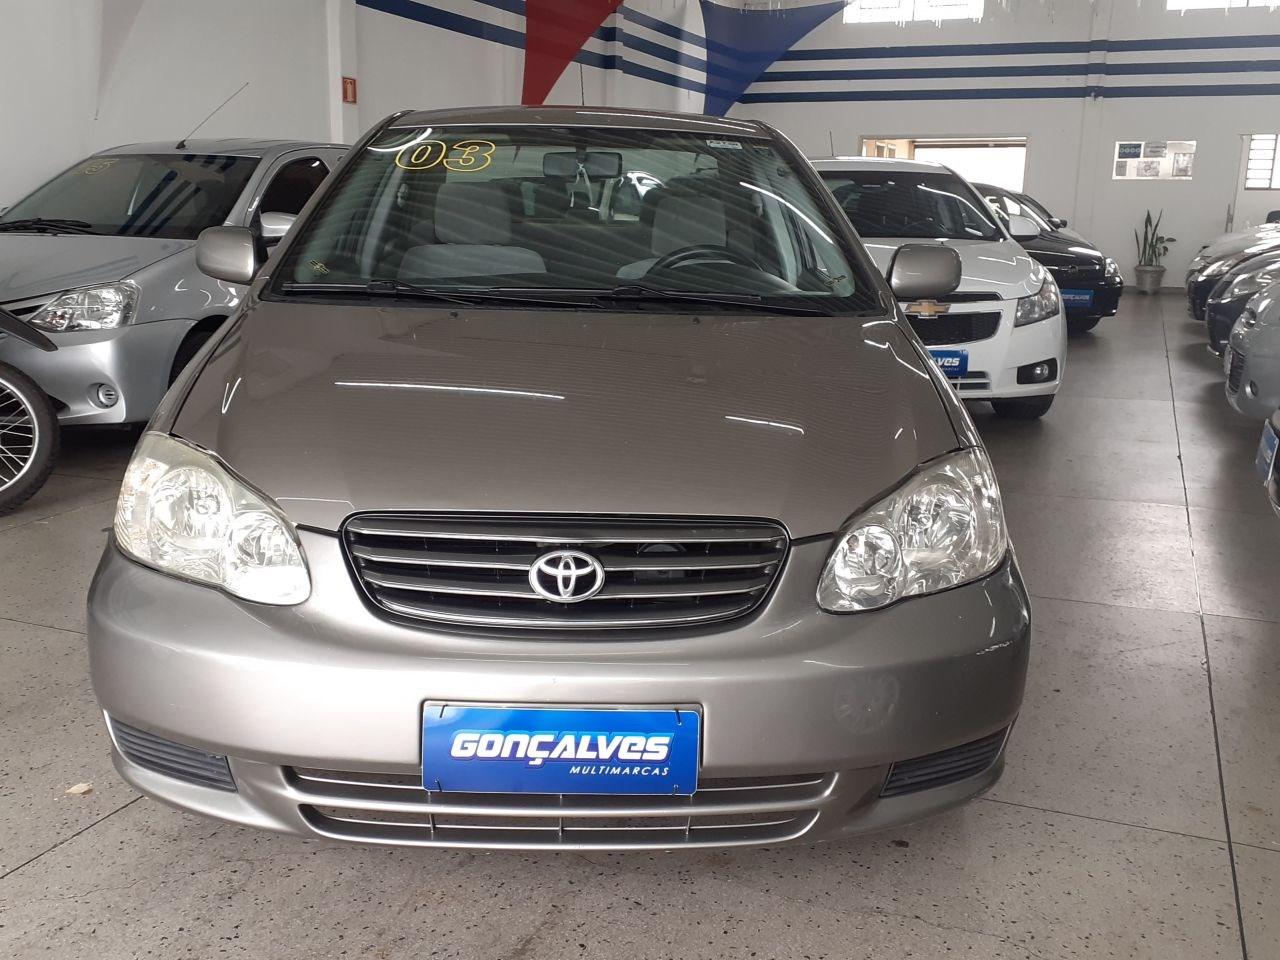 //www.autoline.com.br/carro/toyota/corolla-16-vvt-i-xli-16v-gasolina-4p-manual/2003/piracicaba-sp/12670852